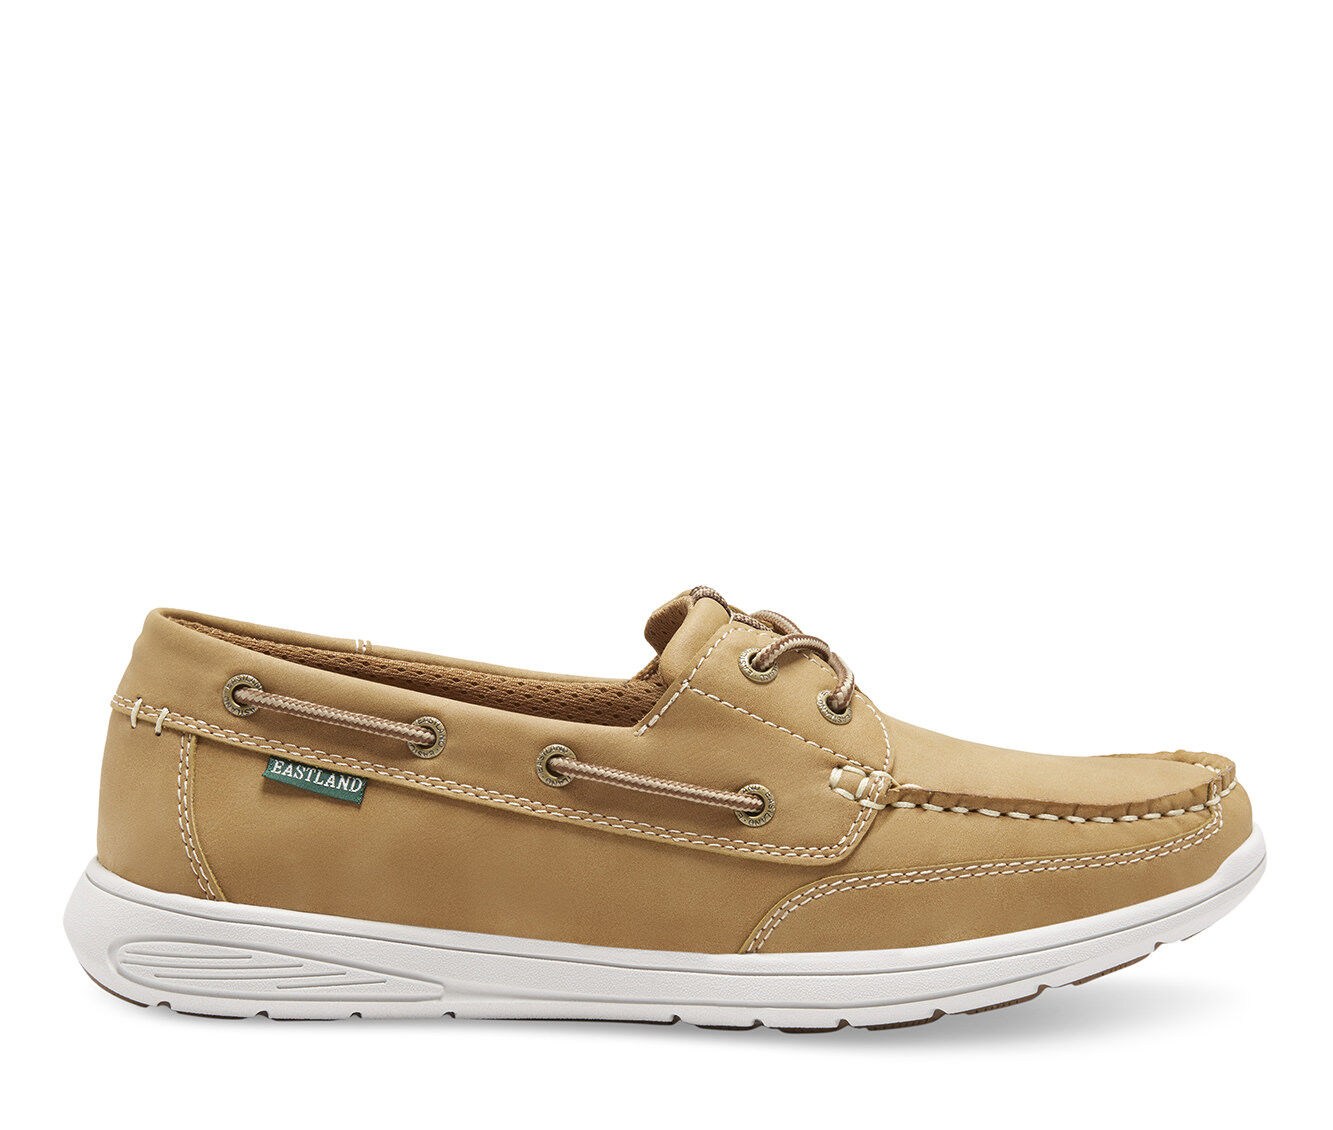 Men's Eastland Benton Boat Shoes Khaki